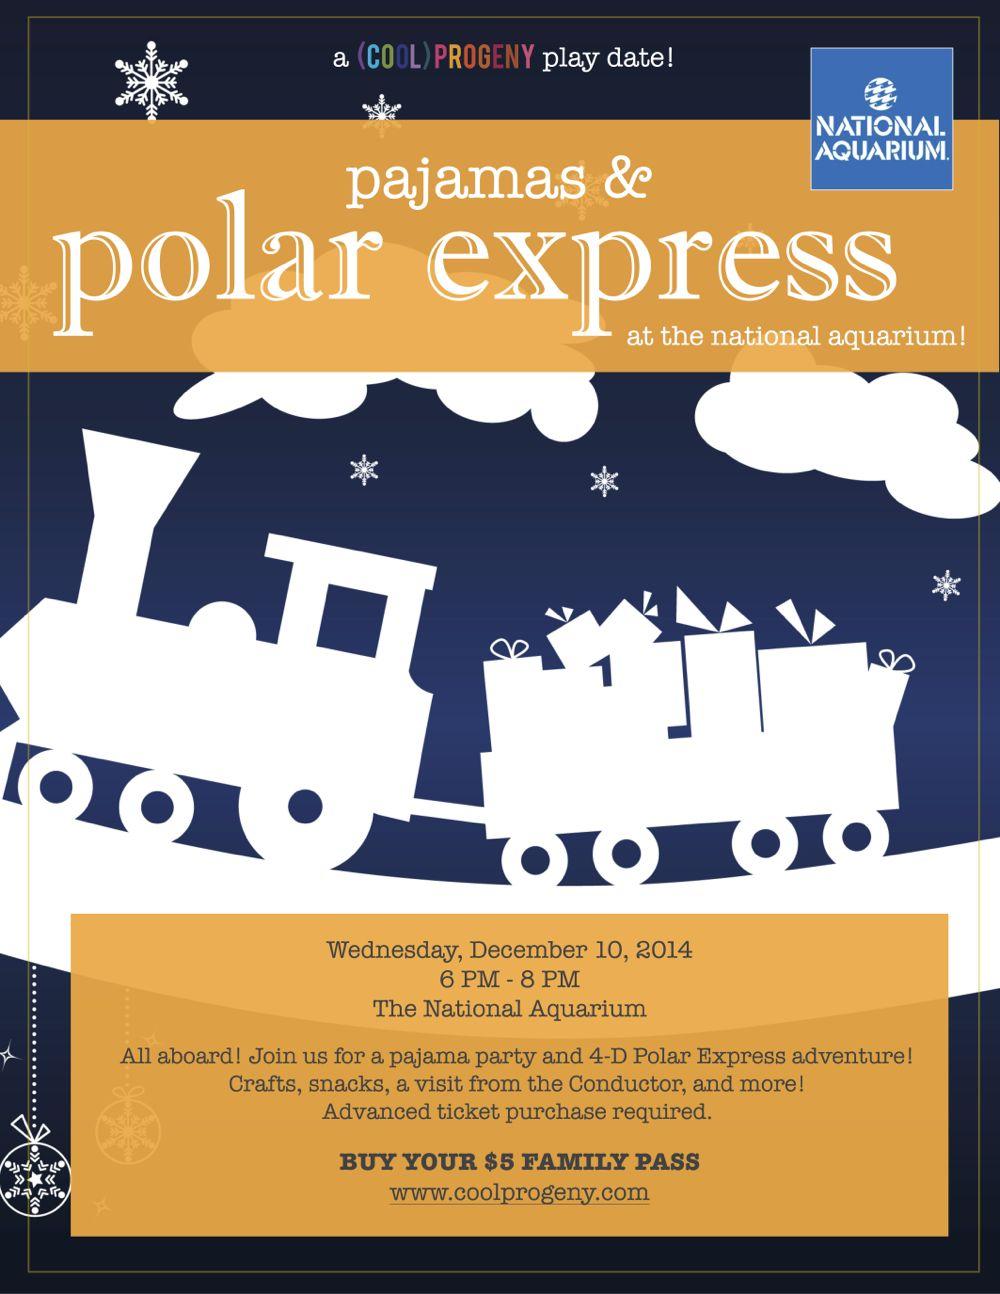 PJs + Polar Express - a (cool) progeny playdate